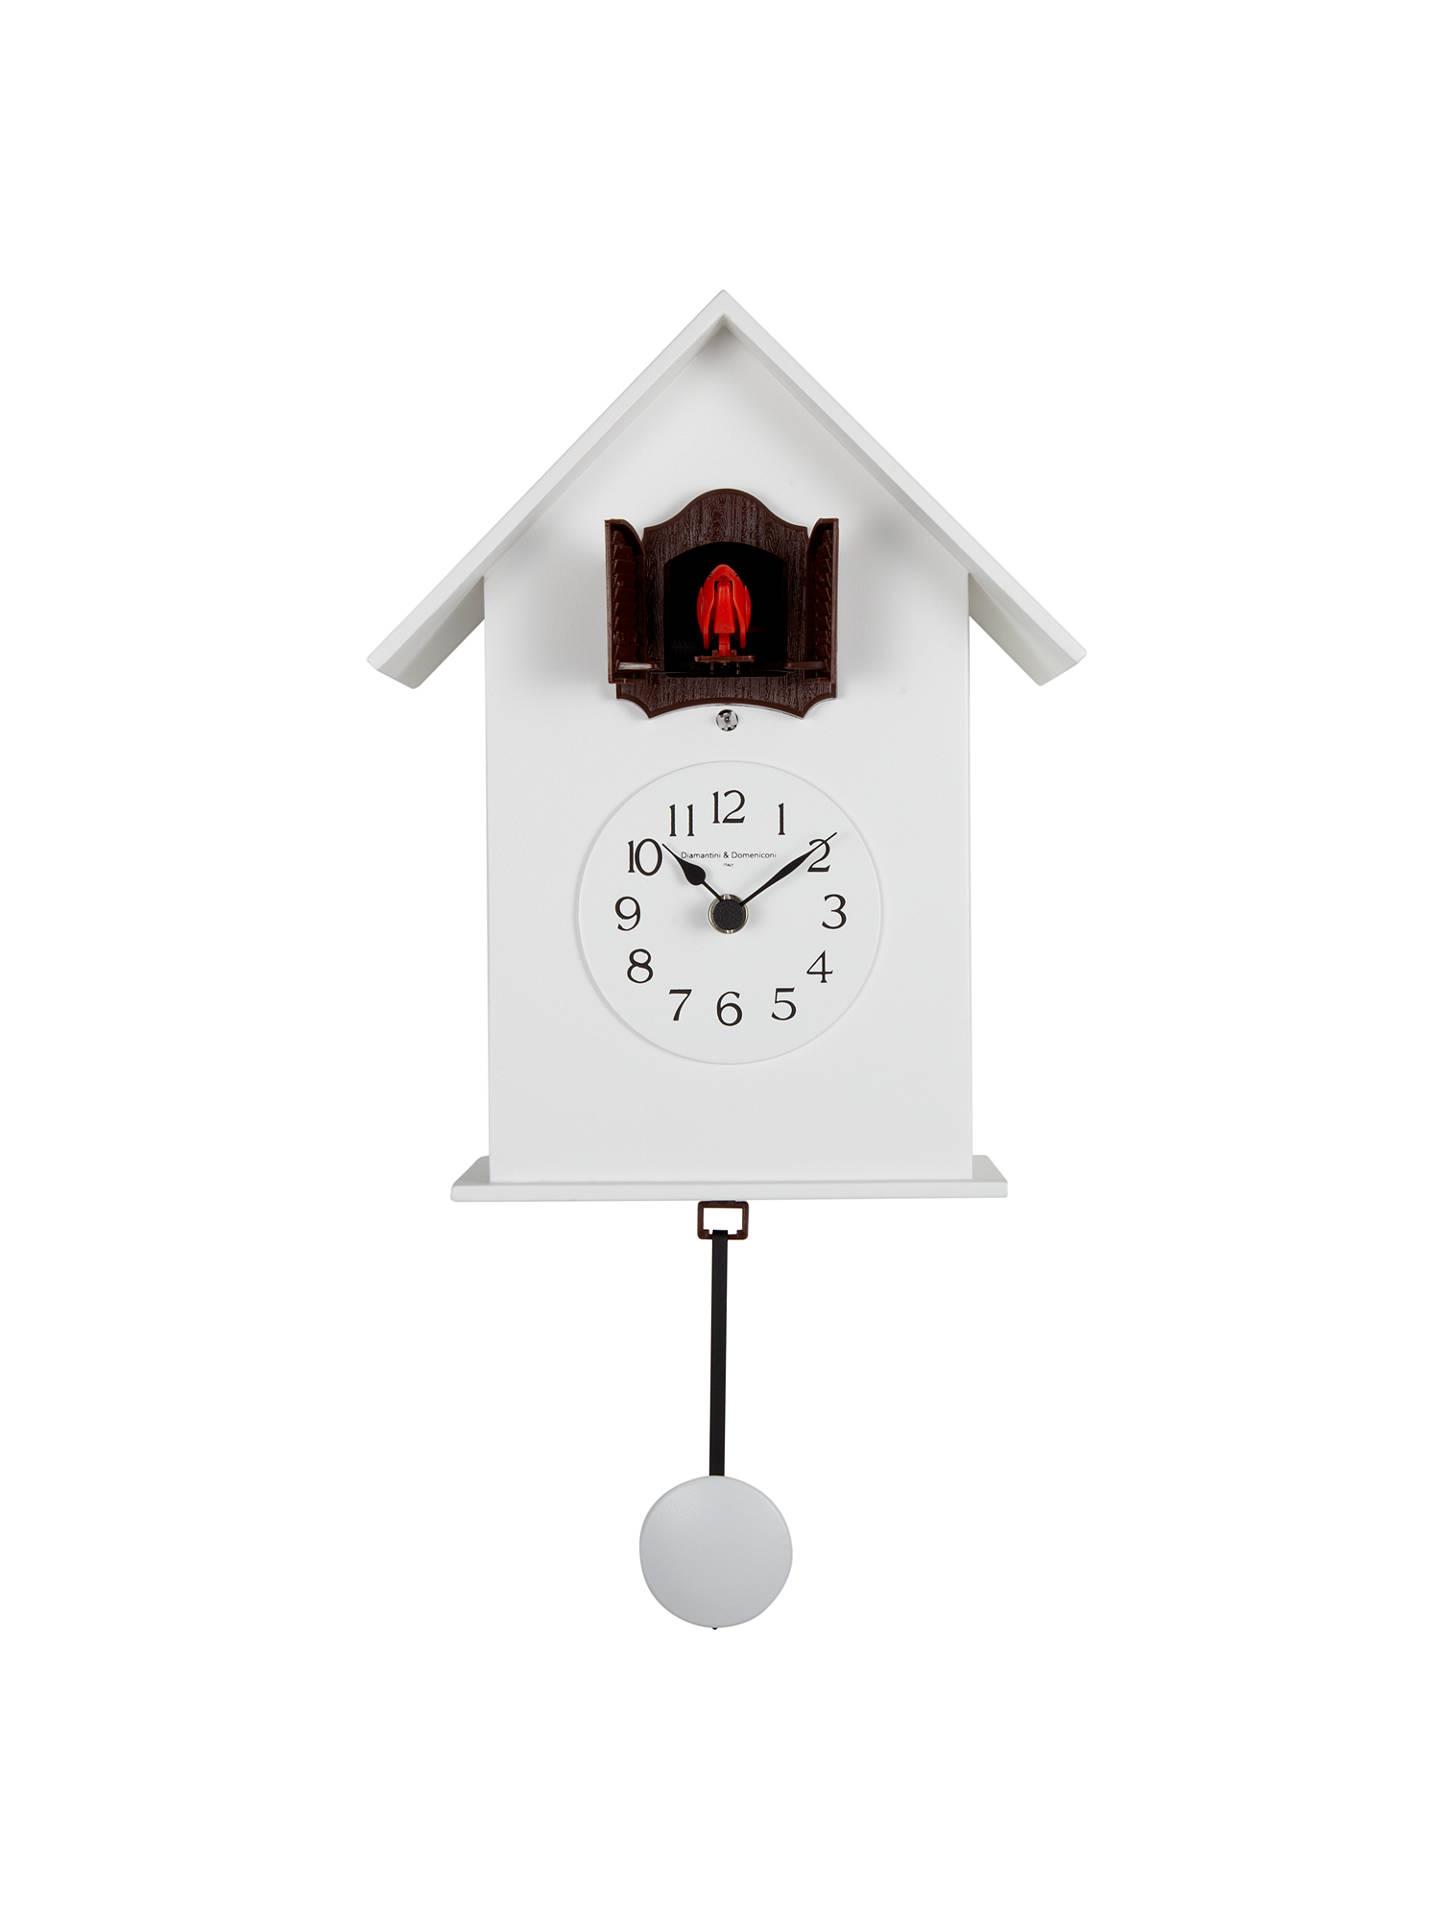 Diamantini Domeniconi Meridiana Cucu Wall Clock White Dia 18cm Online At